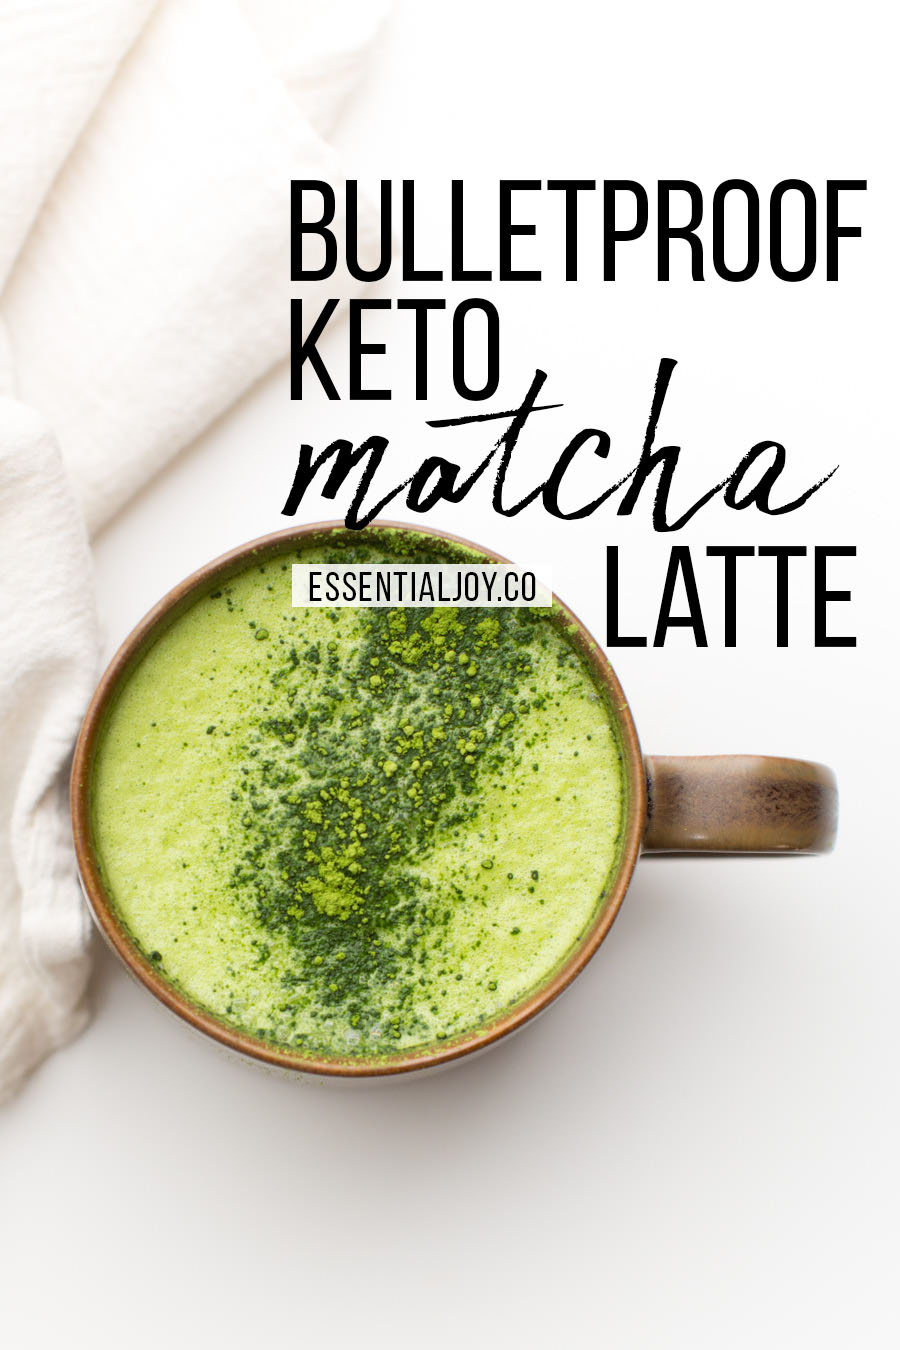 Bulletproof Keto Matcha Green Tea Latte Recipe